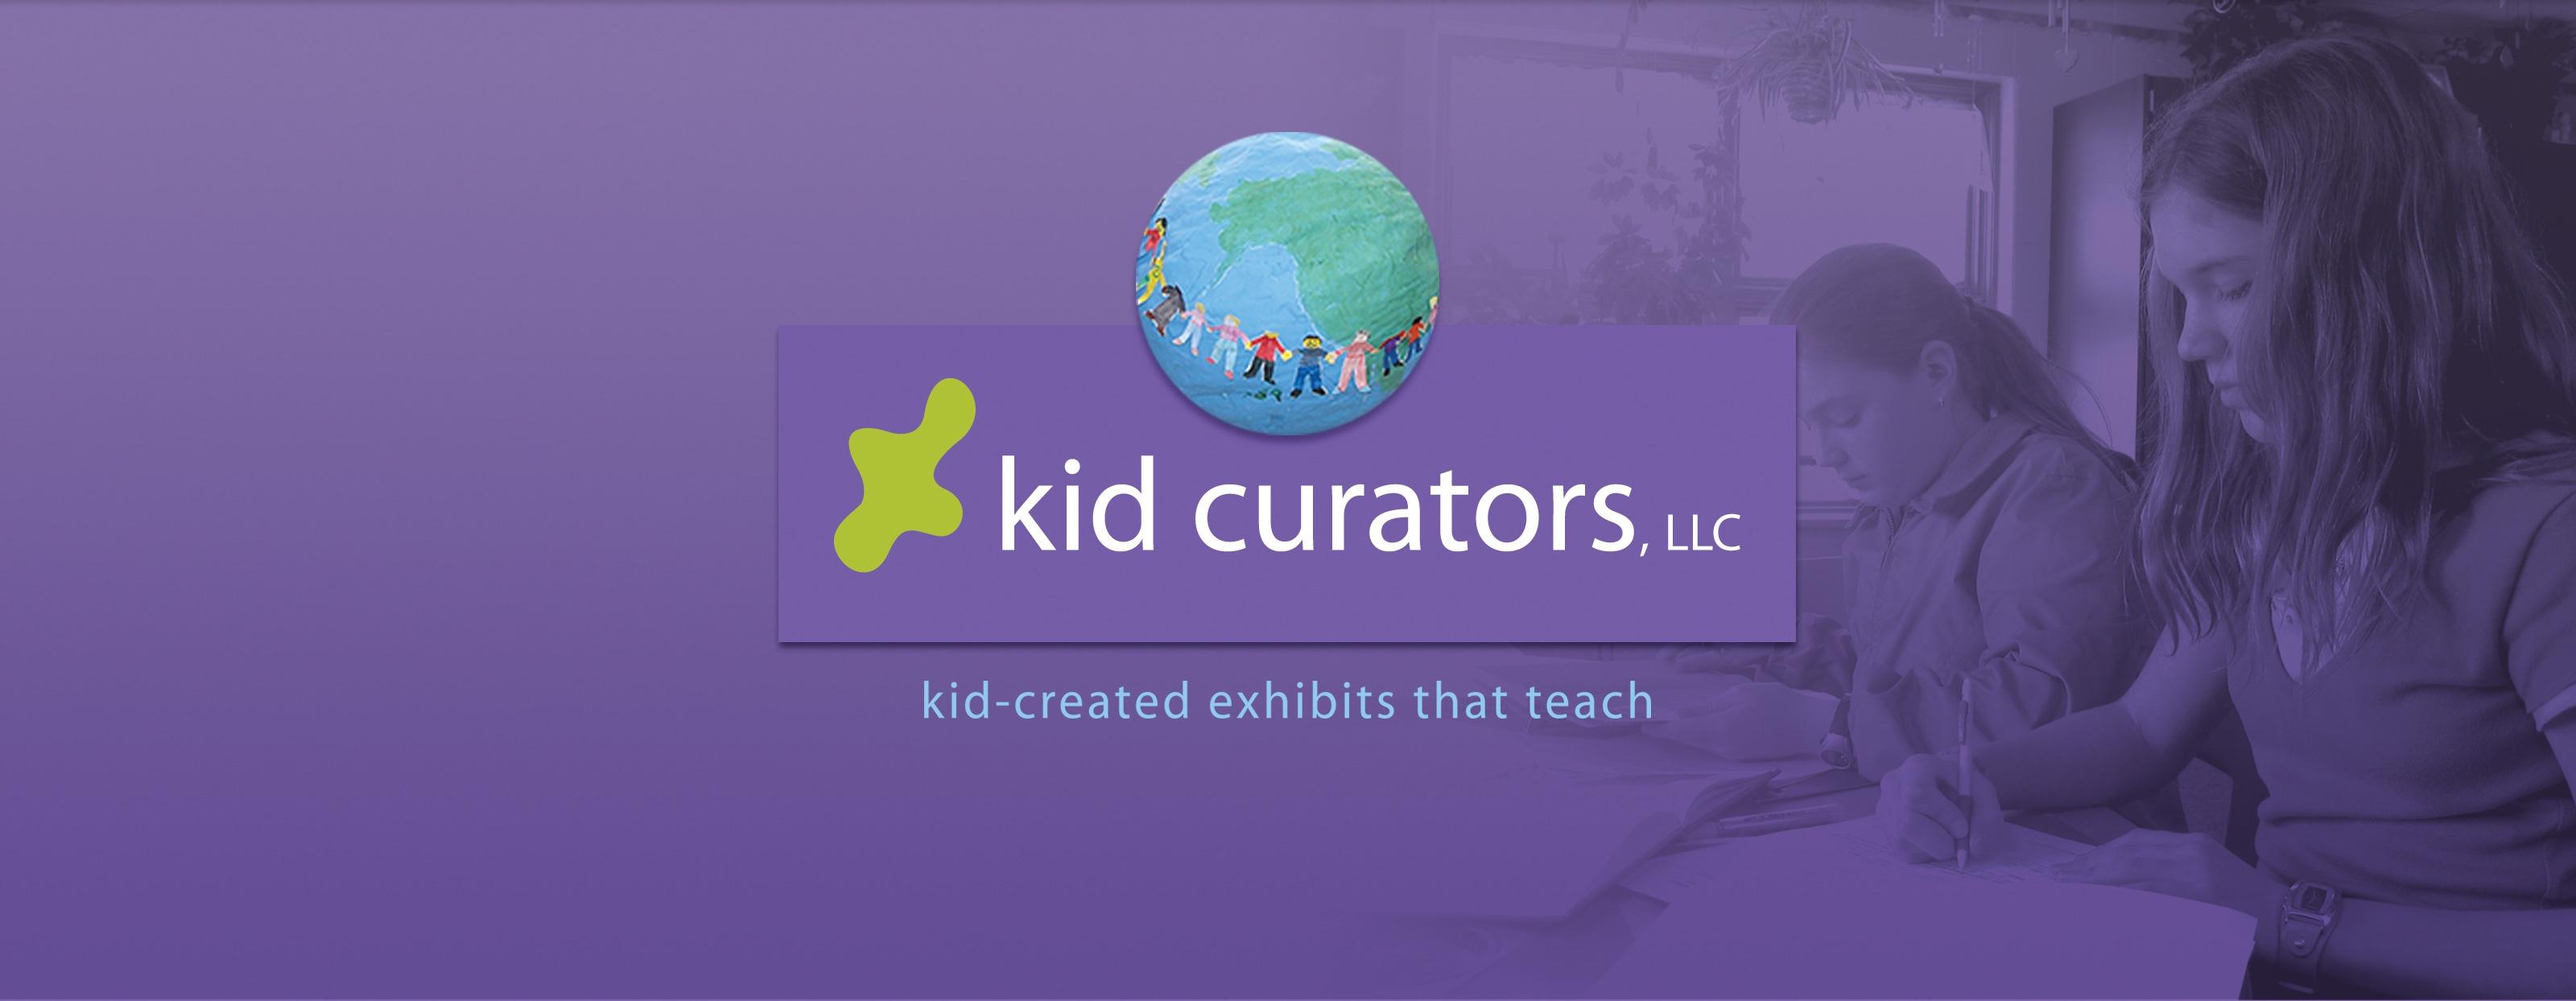 kid-curators-home-slide1